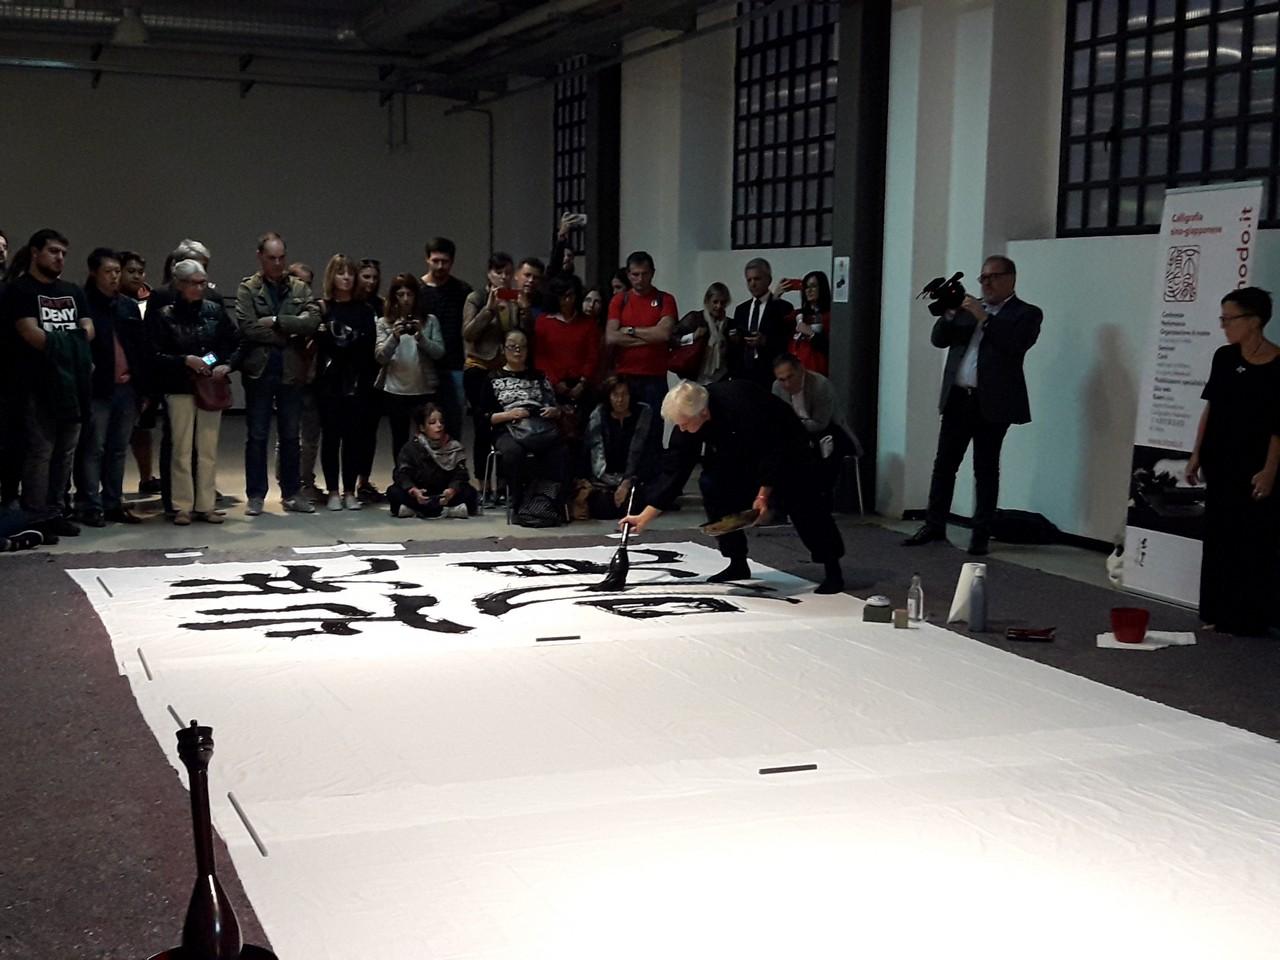 JapanFestival-Milano2018-fotoPagineZeni_025